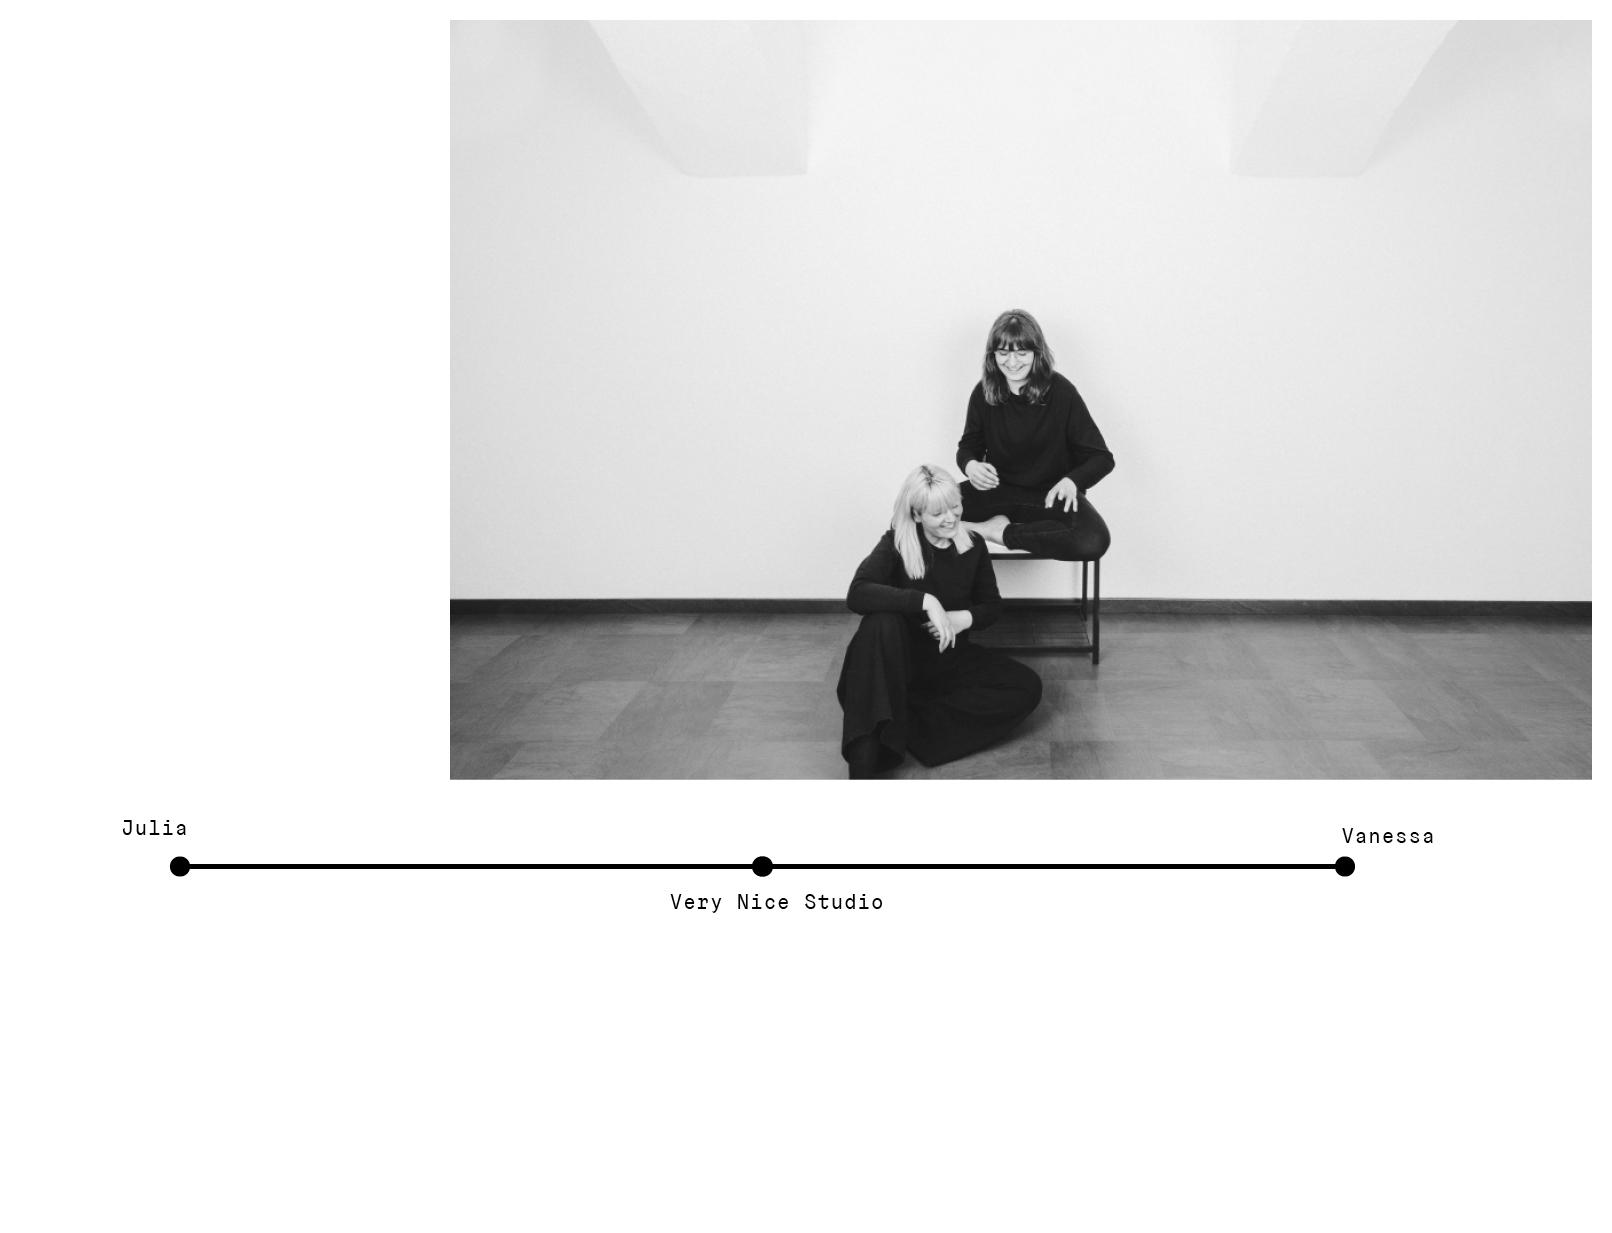 Julia & Vanessa, Very Nice Studio Lebenslinie for HDIGH Interview Photo Credit ©verynicestudio